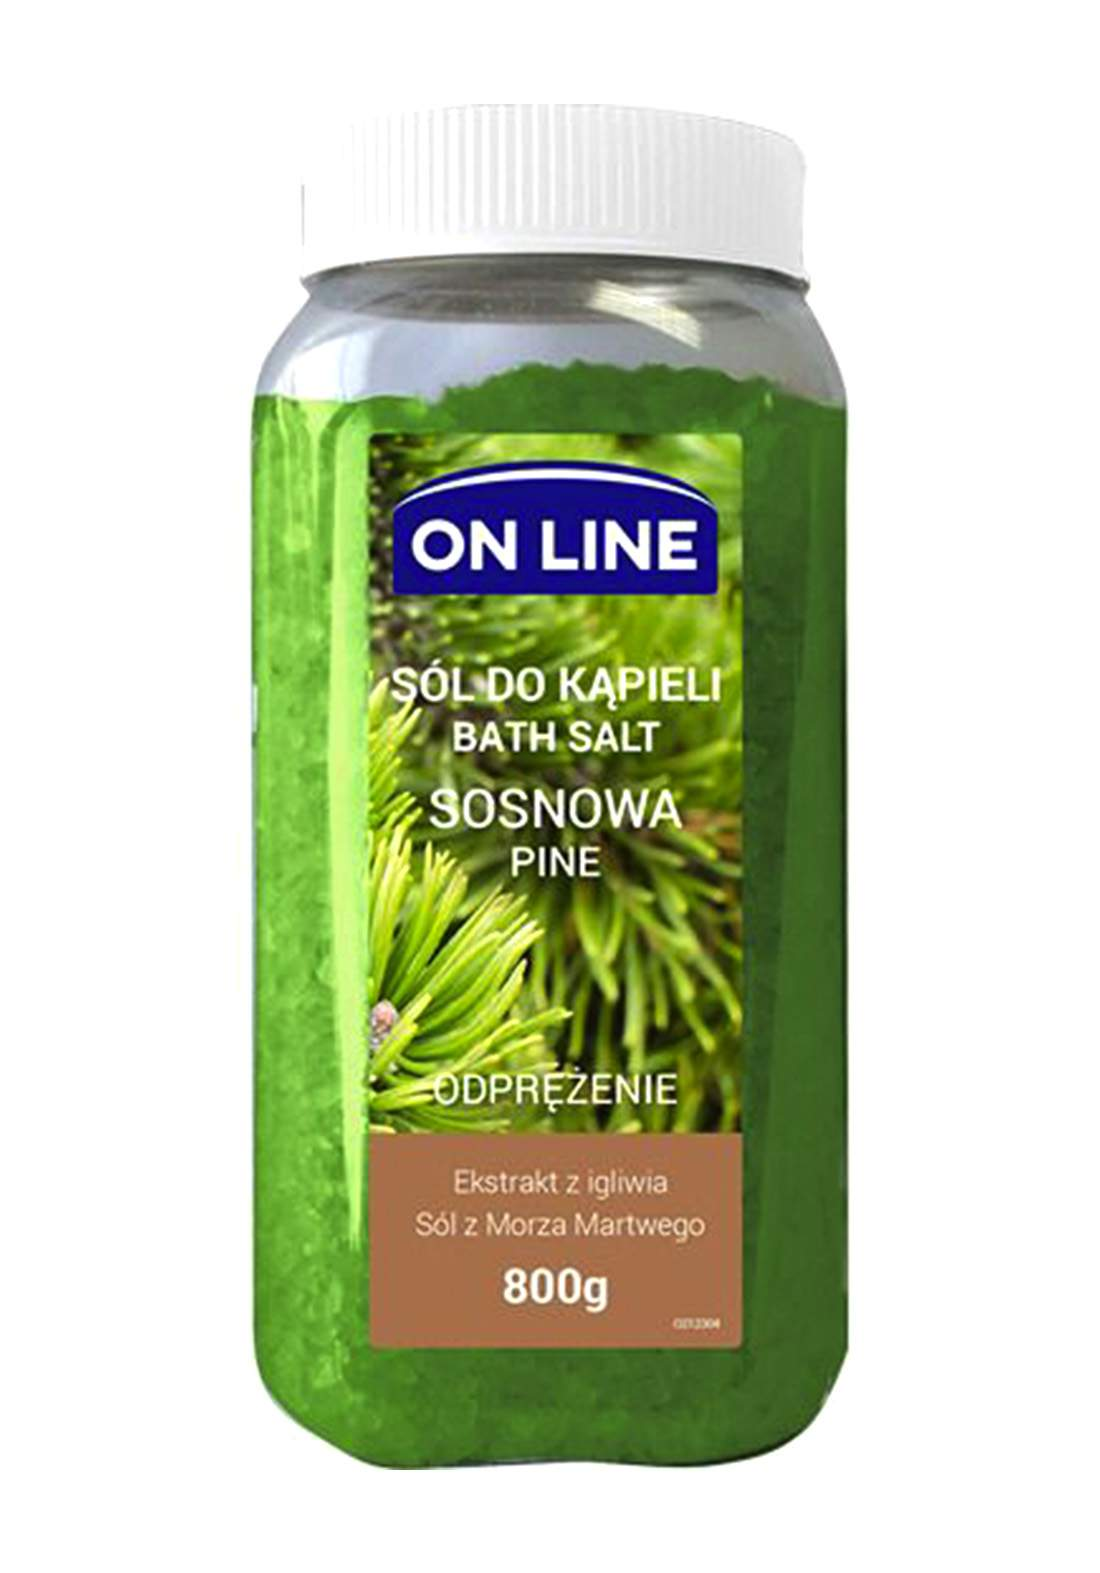 Online Pine bath salts 800g املاح العناية بالجسم